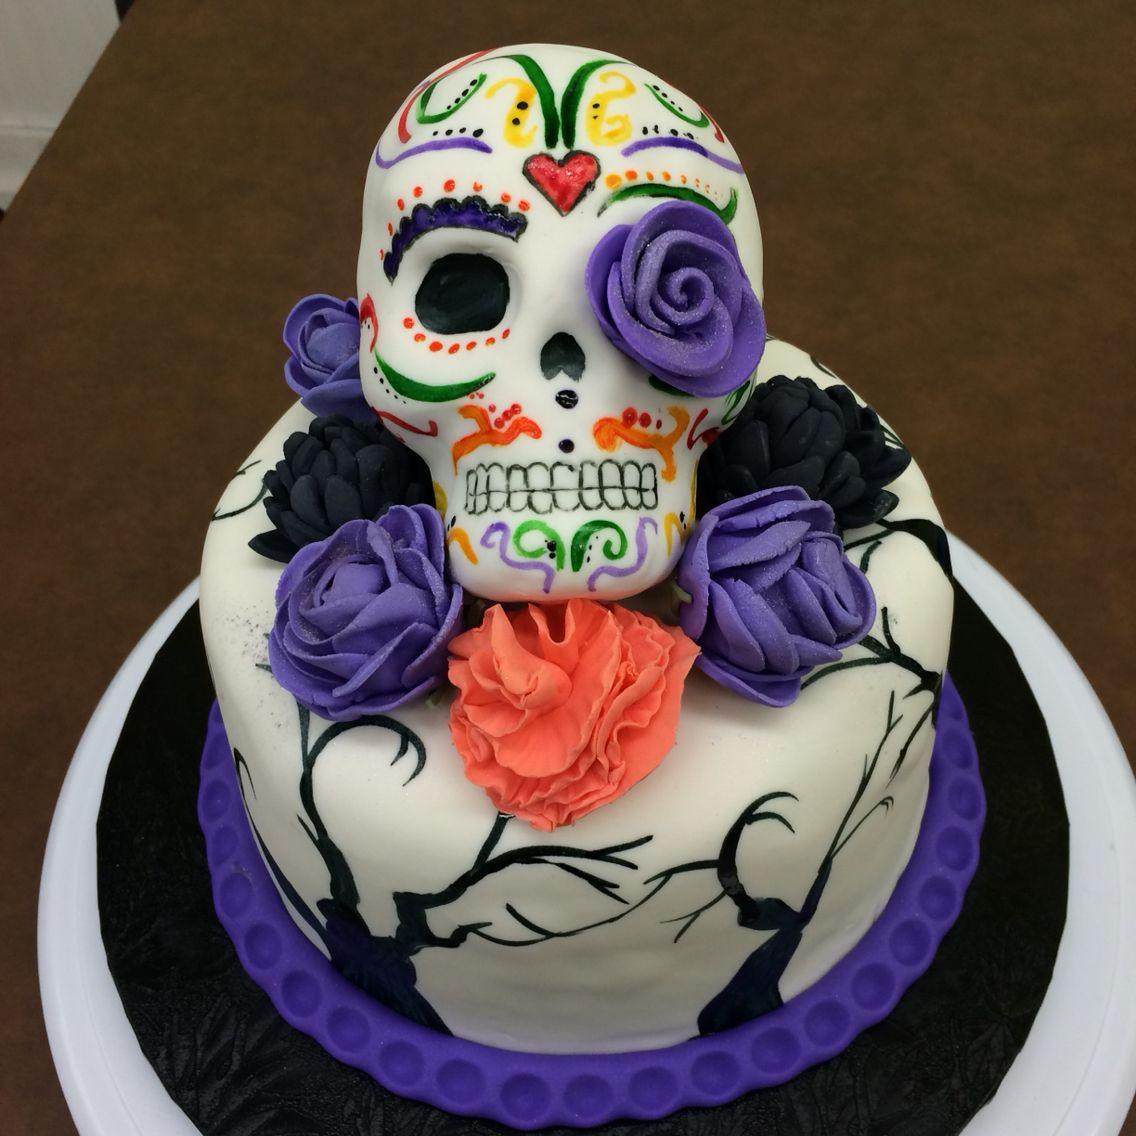 the skull halloween cake le cr ne g teau d 39 halloween. Black Bedroom Furniture Sets. Home Design Ideas